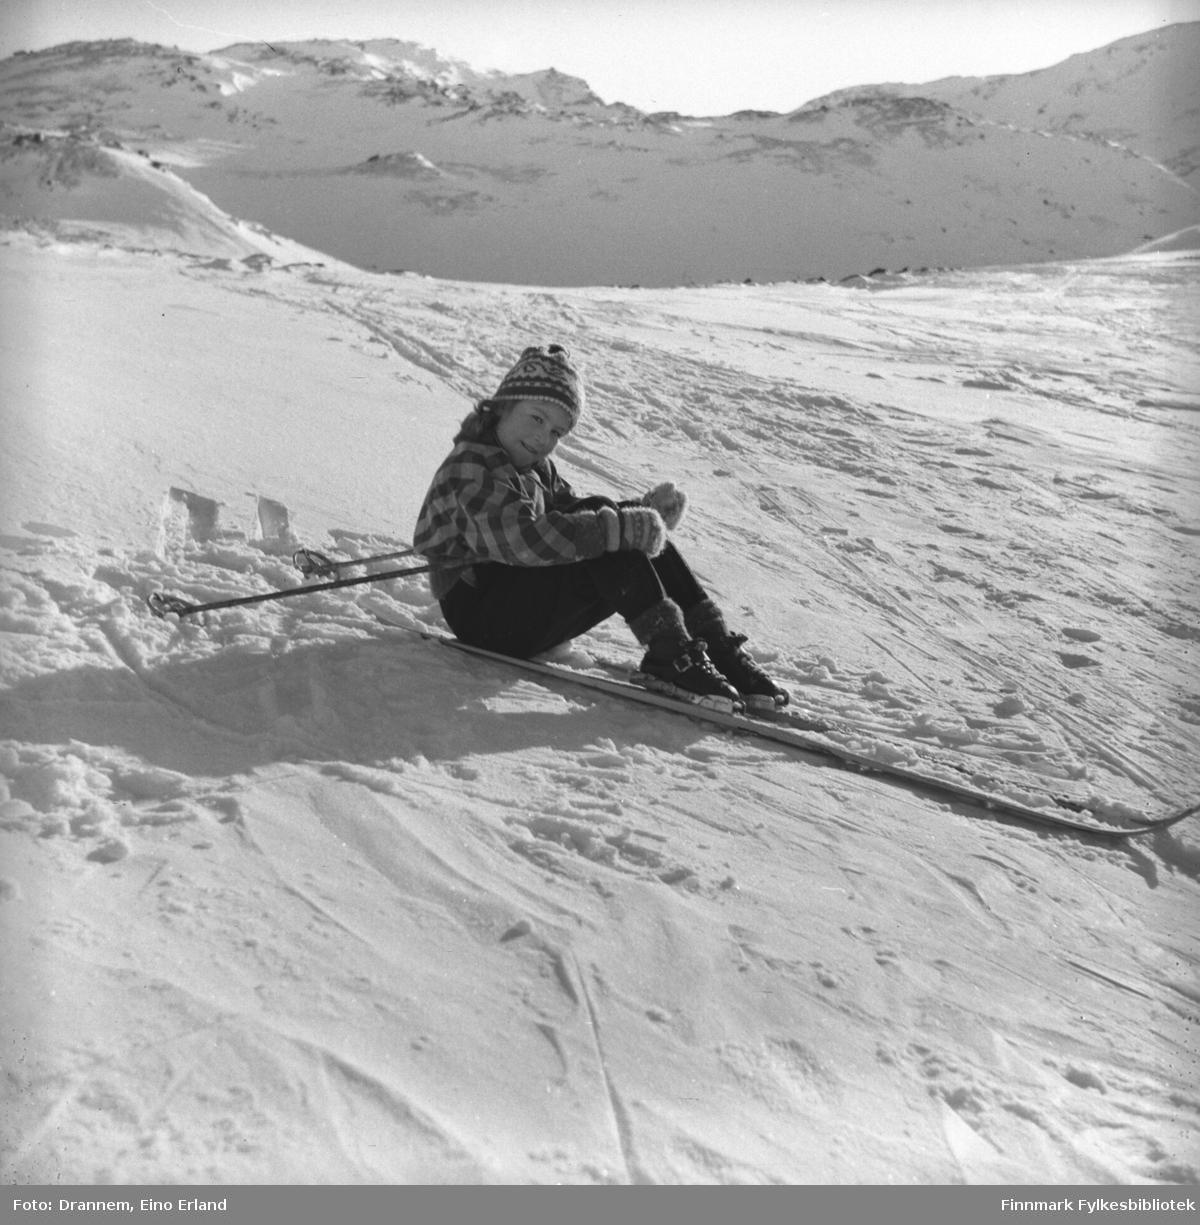 Turid Lillian på skitur i Hammerfest